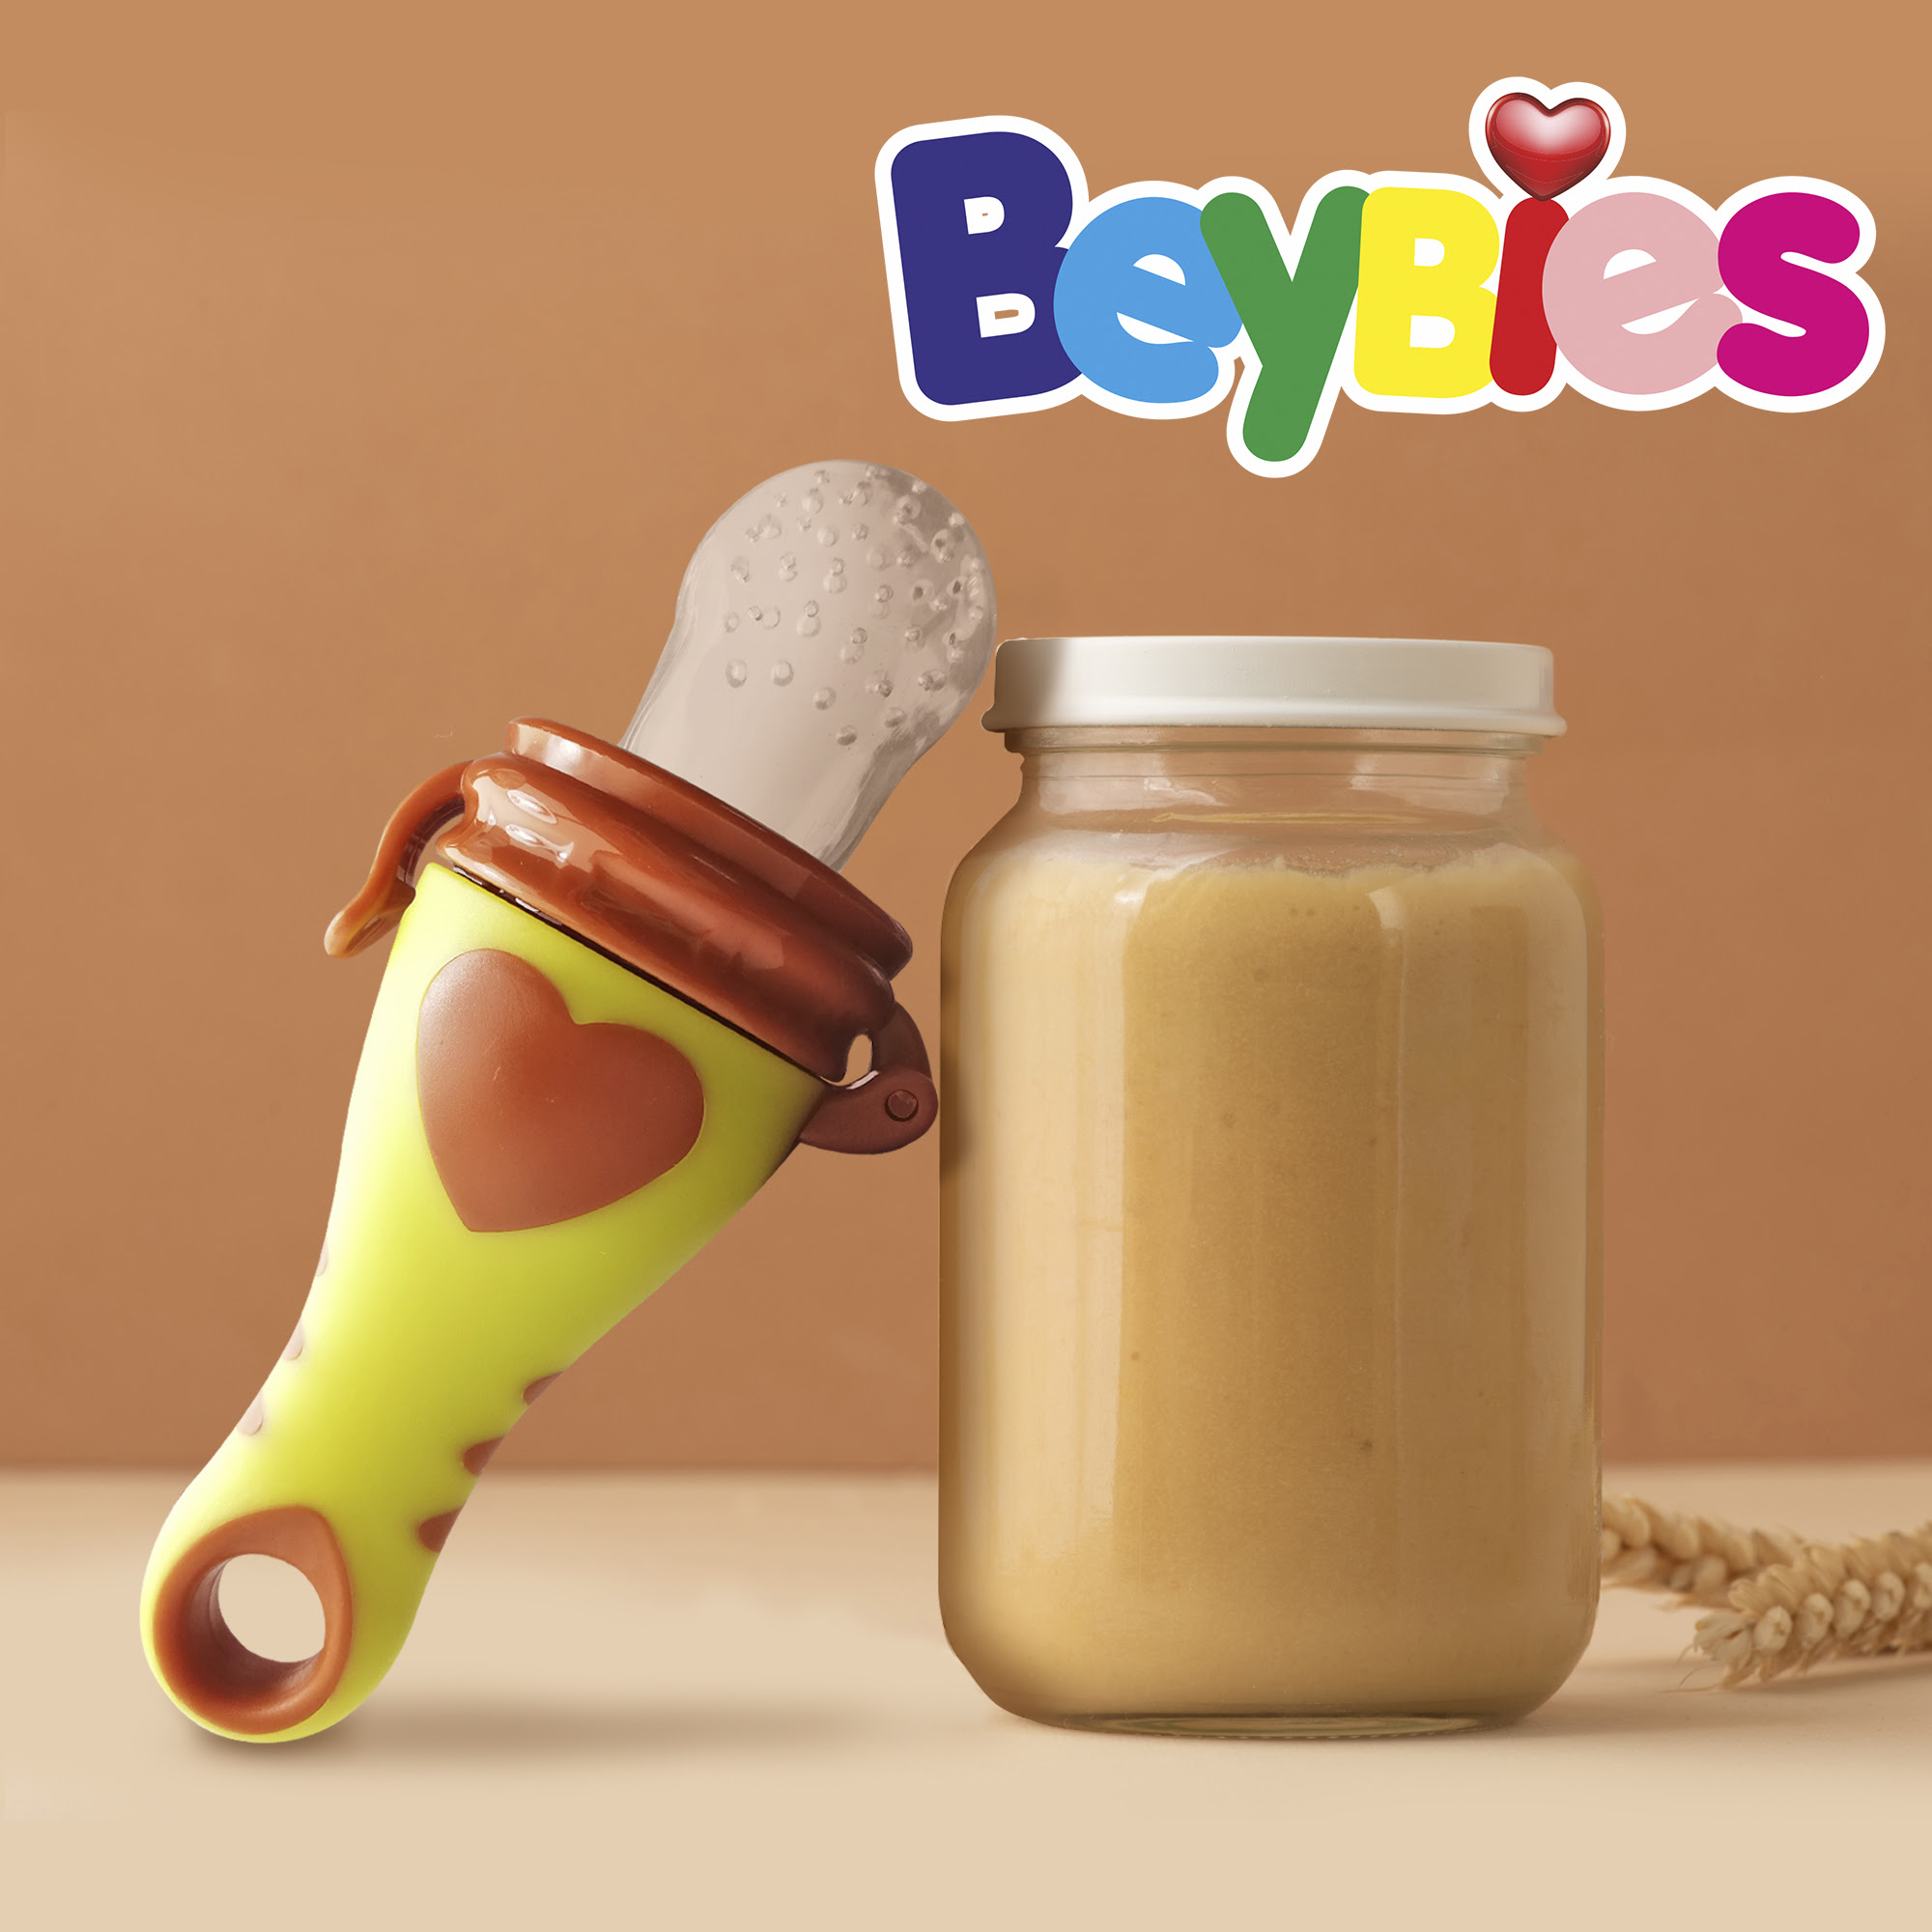 accesorios beybies